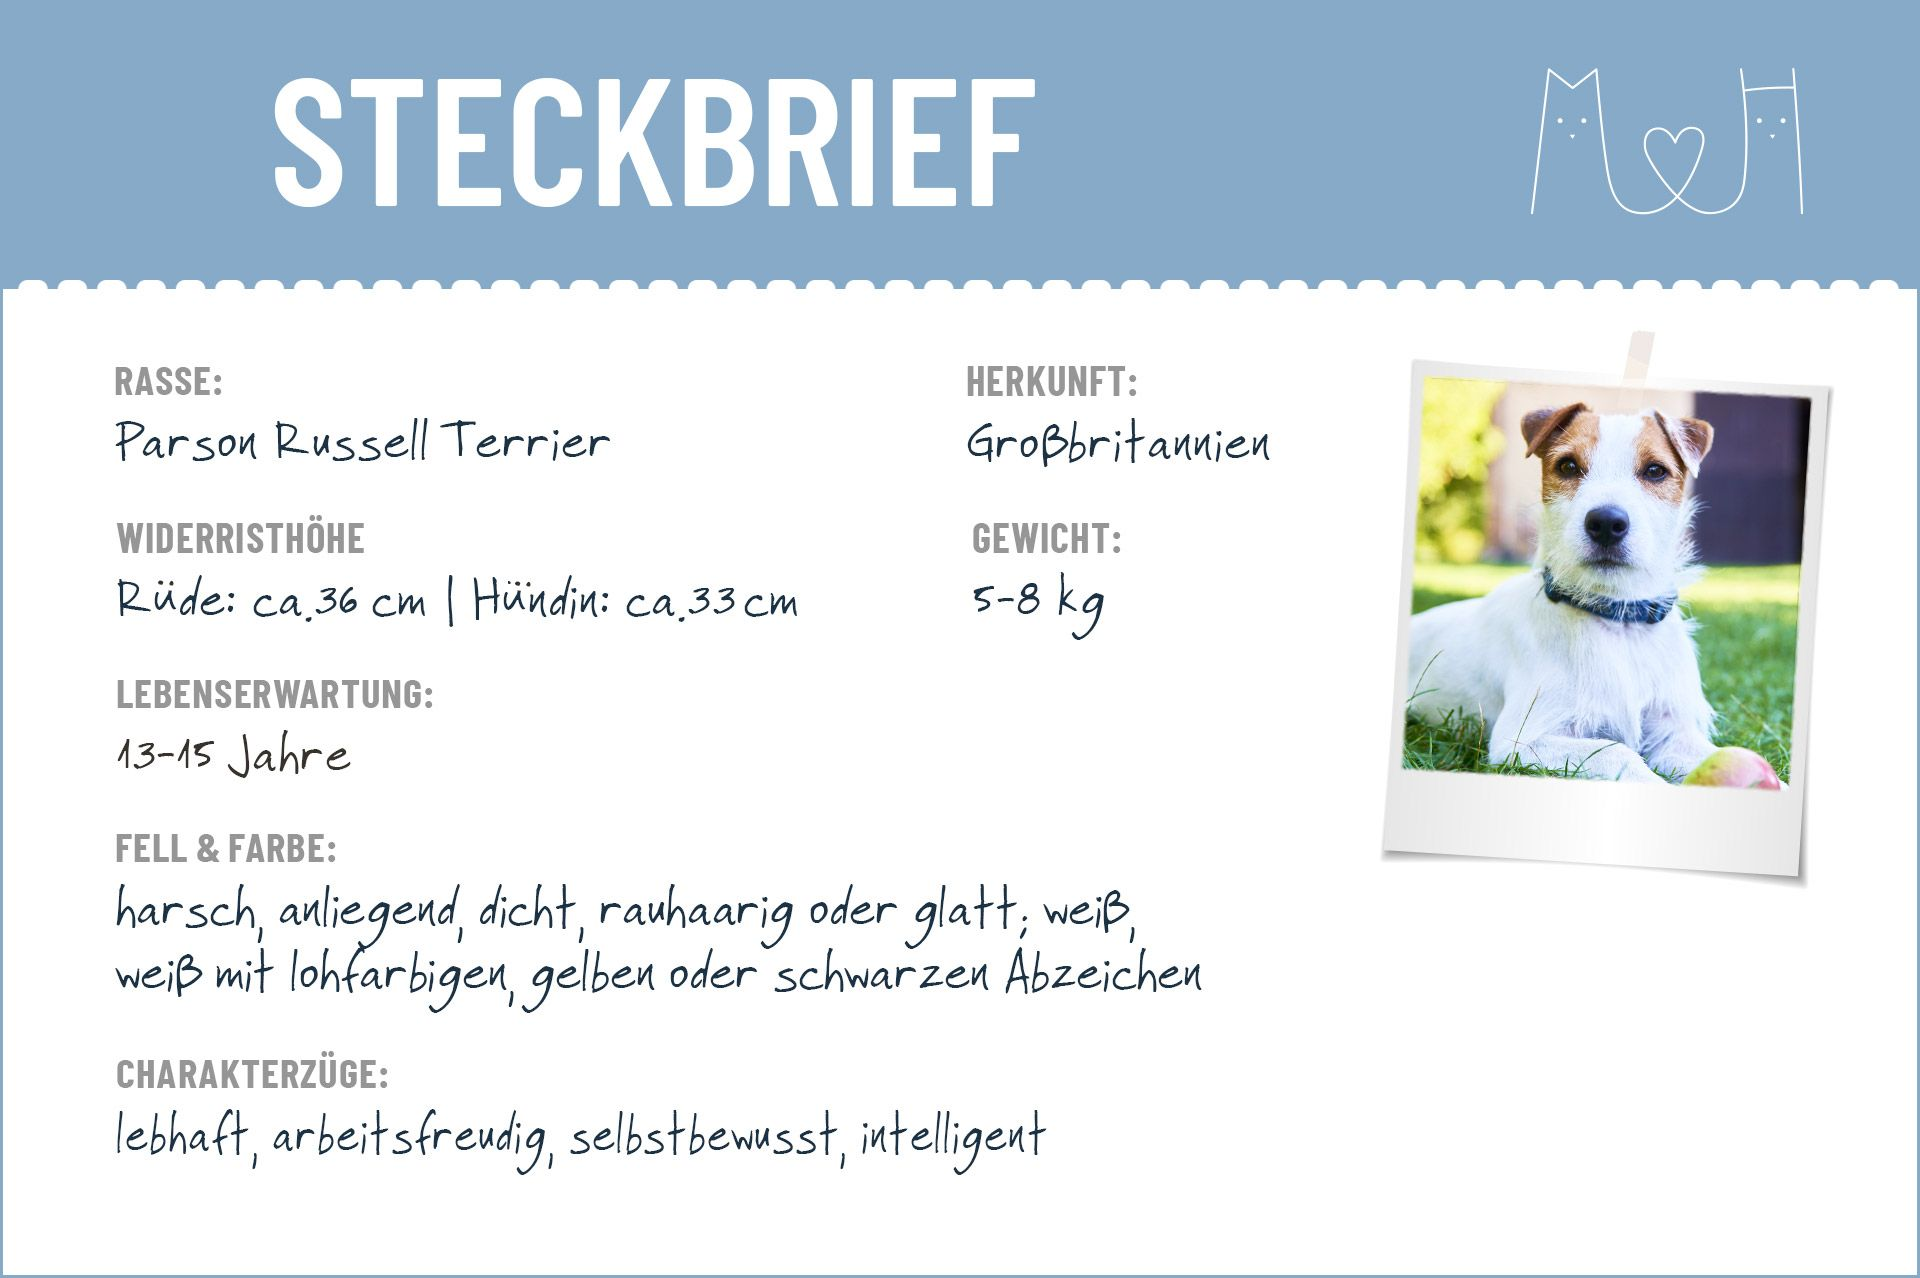 Parson Russell Terrier Steckbrief Charakter Wesen Haltung In 2020 Parson Russell Terrier Russell Terrier Terrier